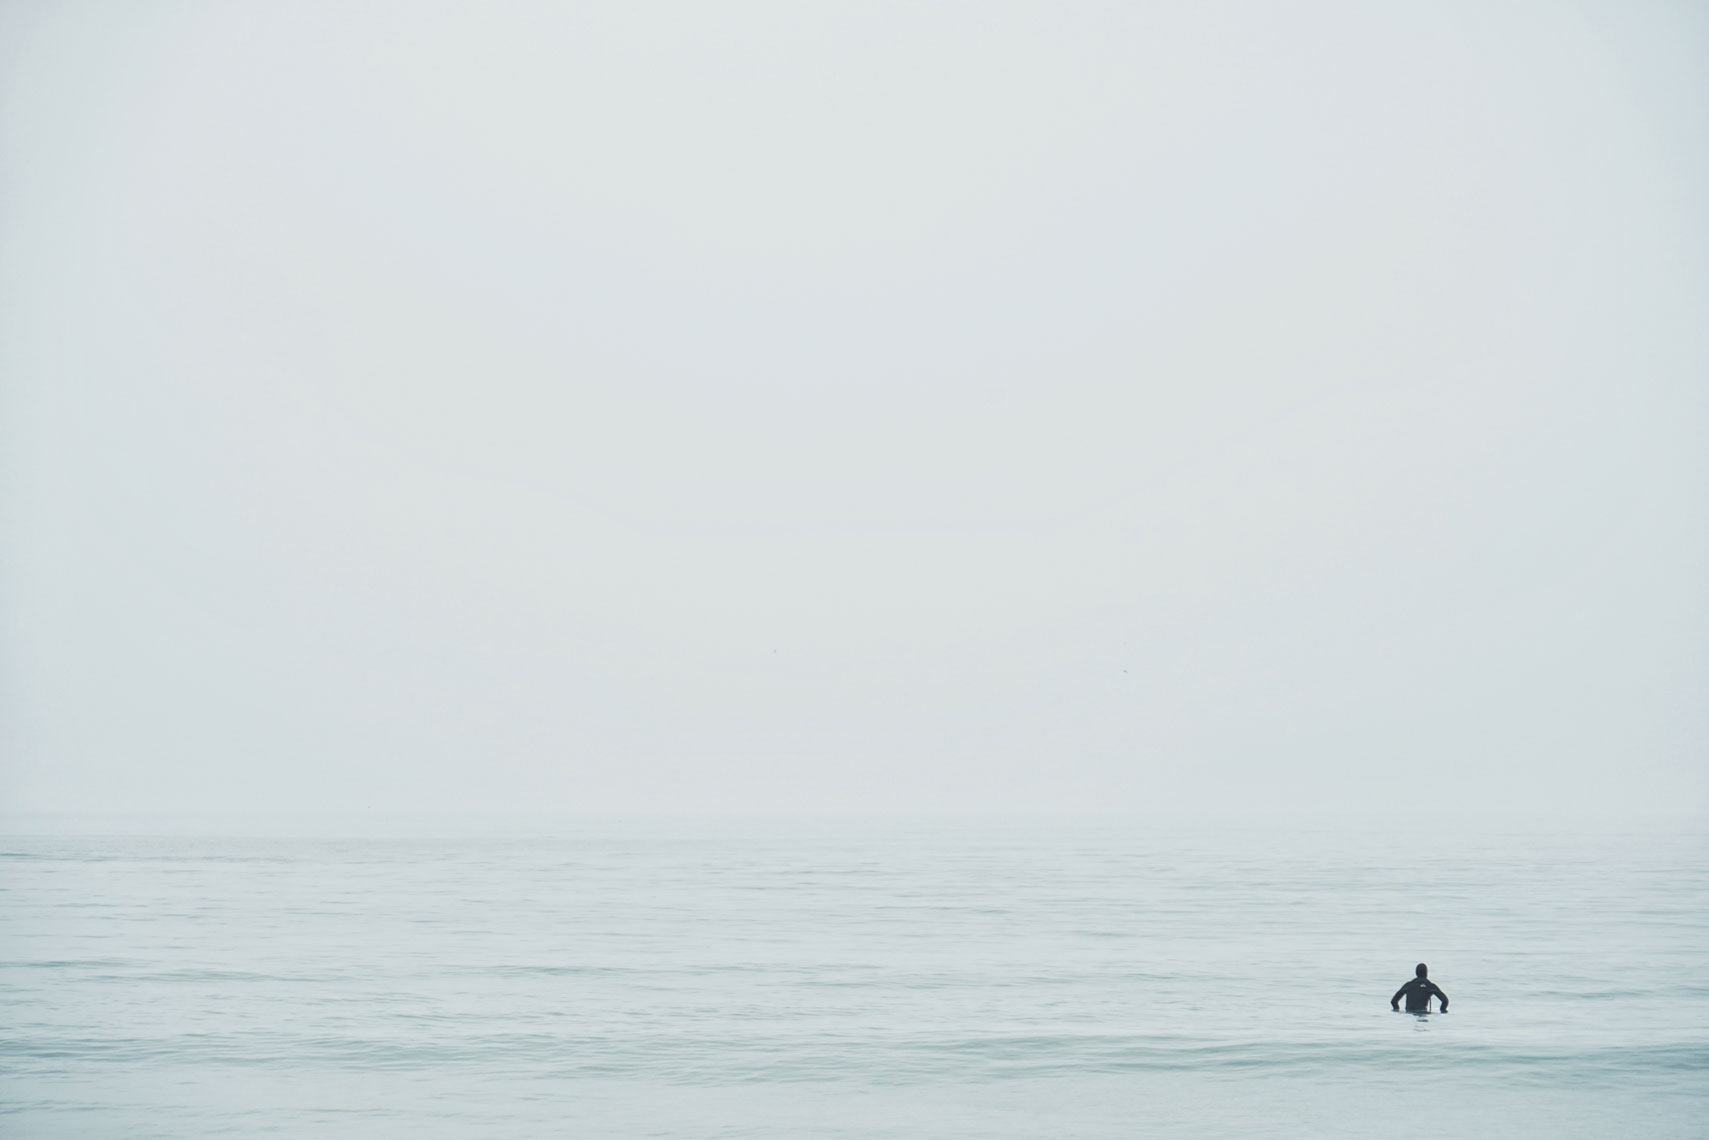 solo-surfer.jpg